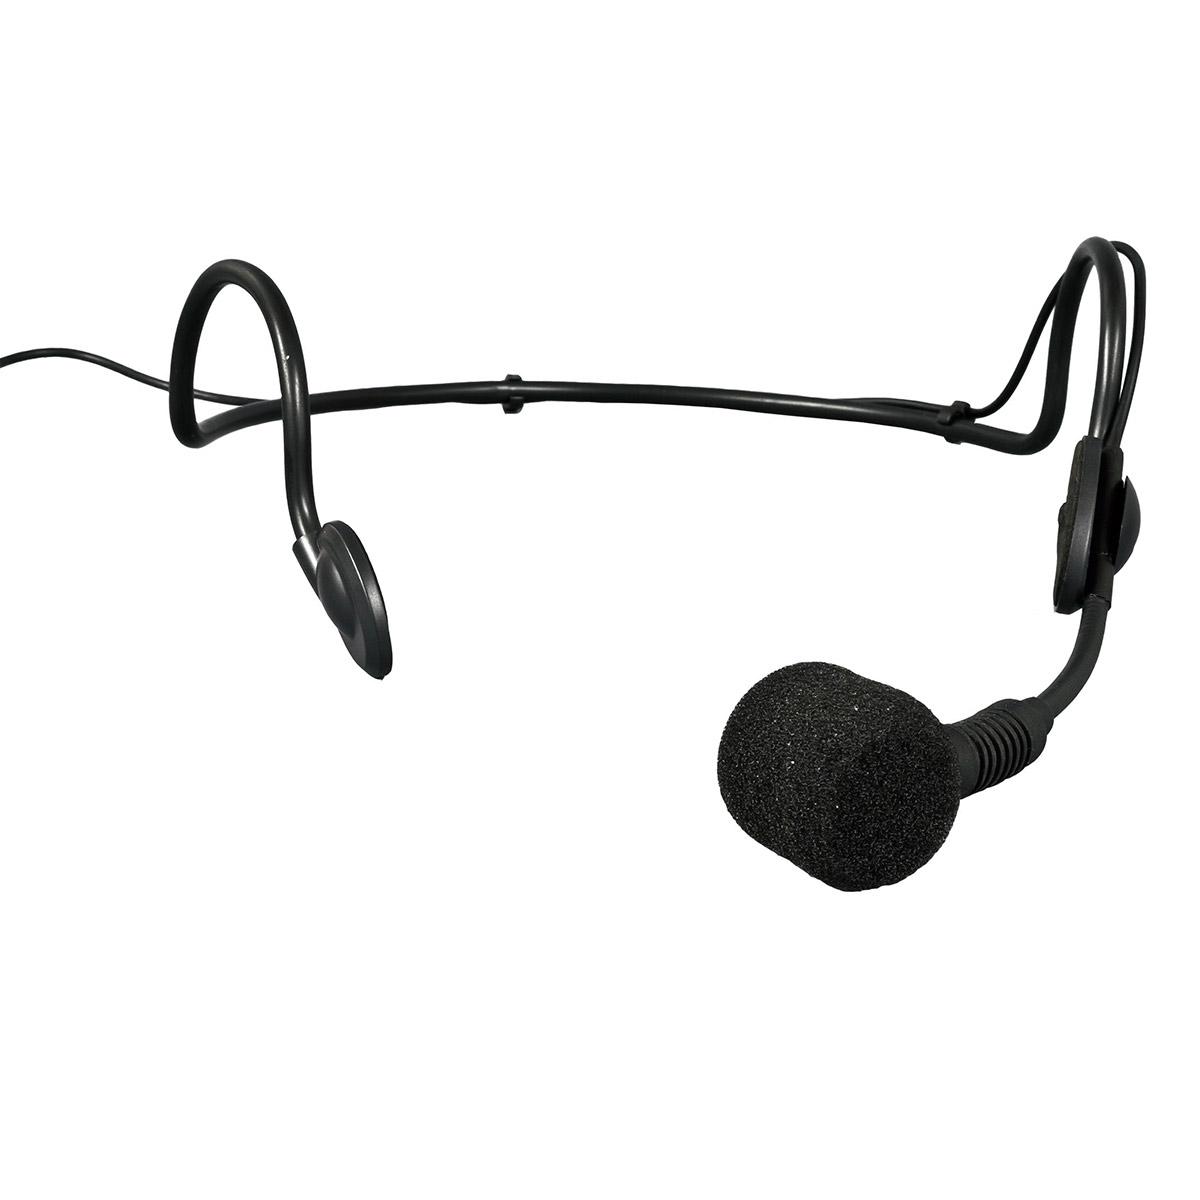 Microfone Headset Com Fio Hmb3 Skp Pro Audio